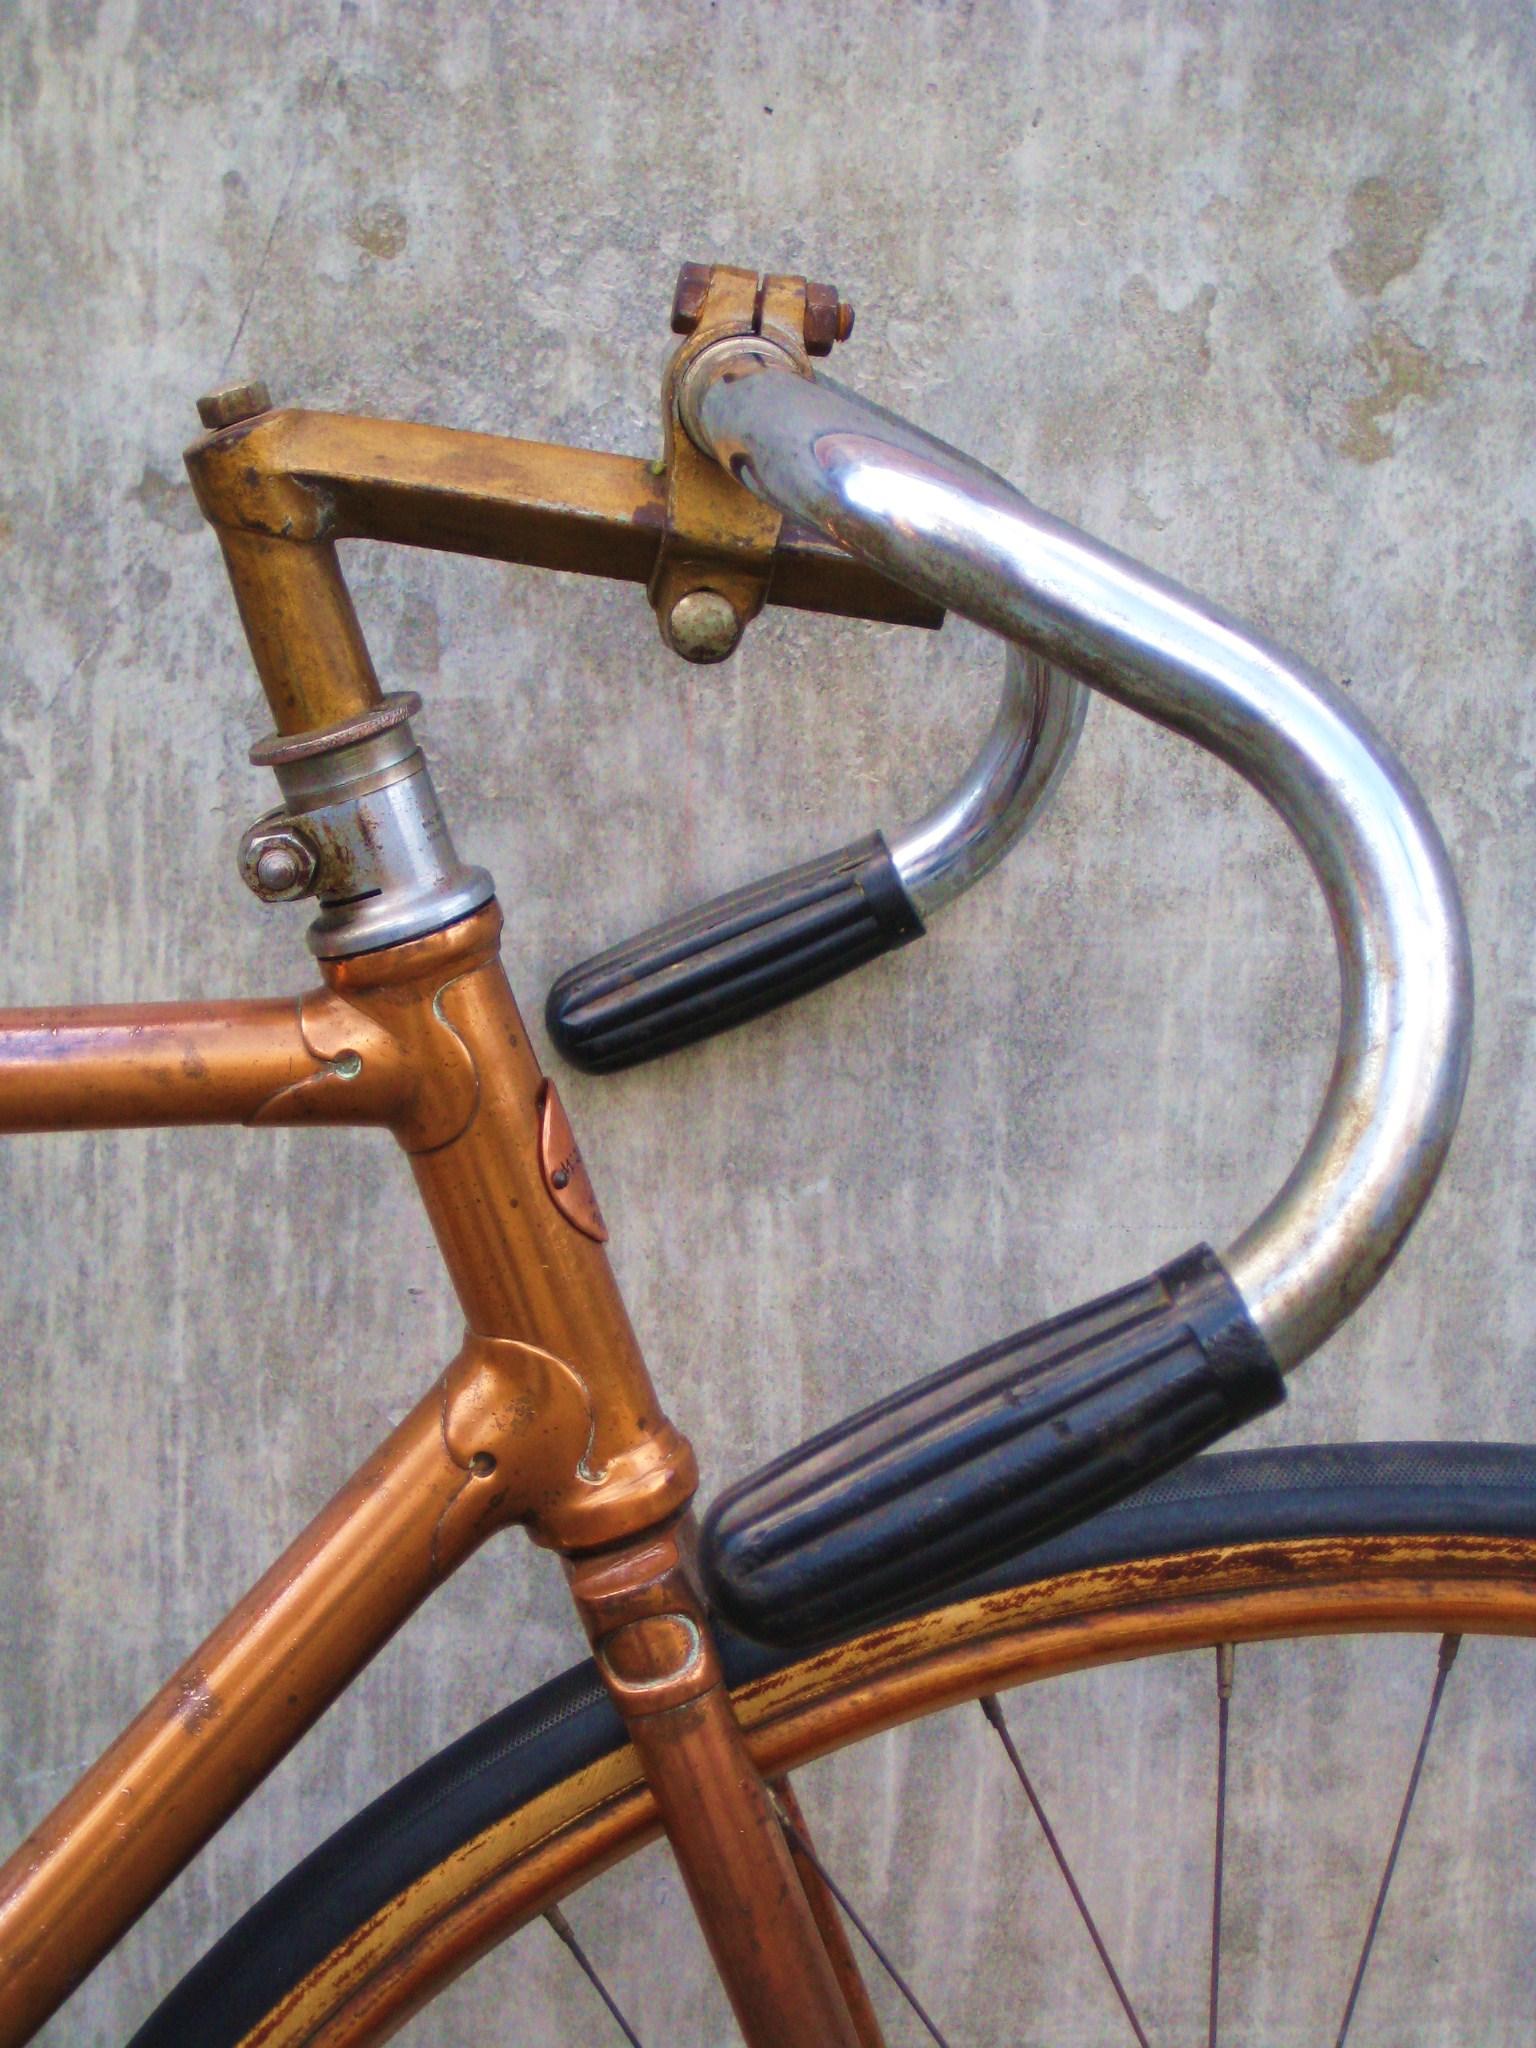 Rare 1925 Copper Plated Appelhans Track Bike Classic